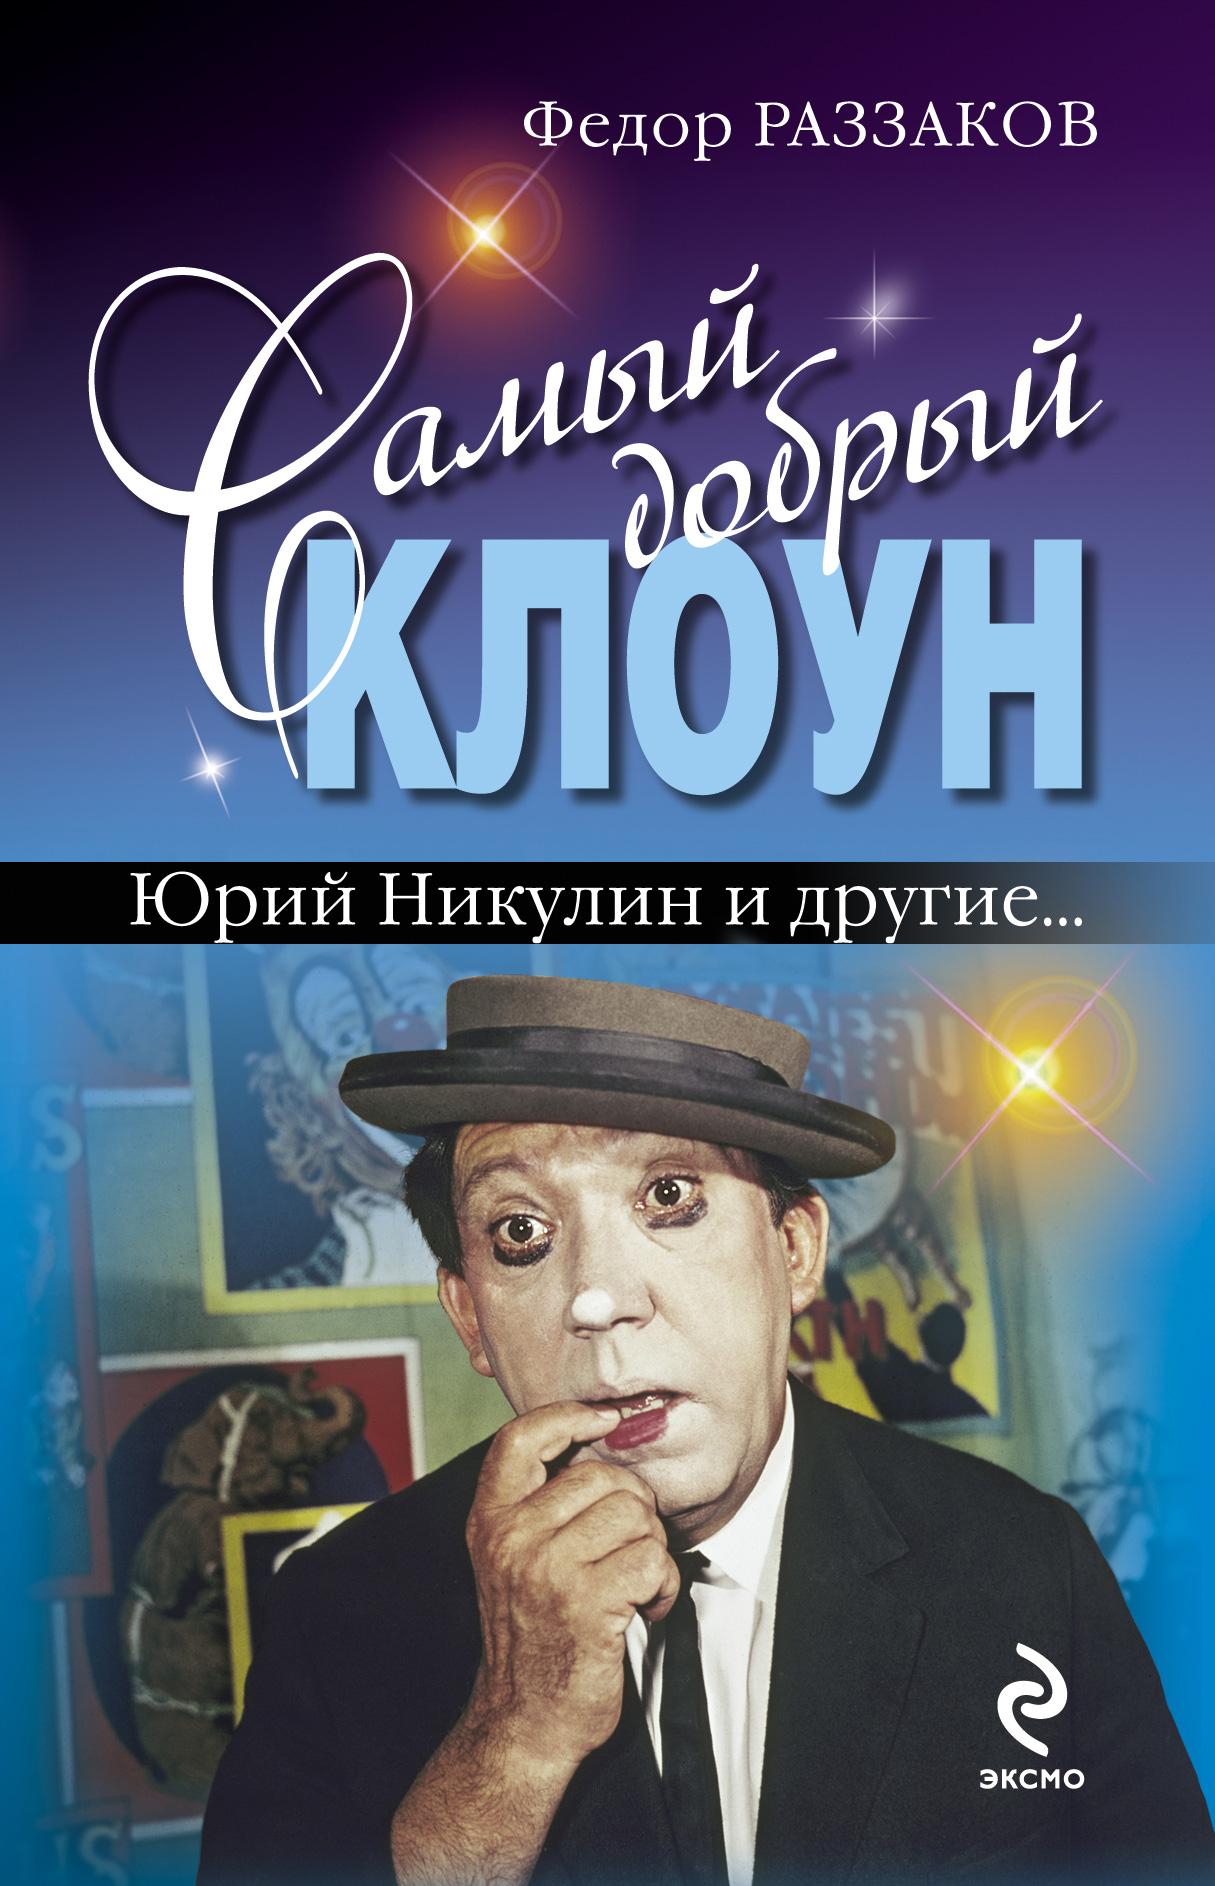 Самый добрый клоун: Юрий Никулин и другие…